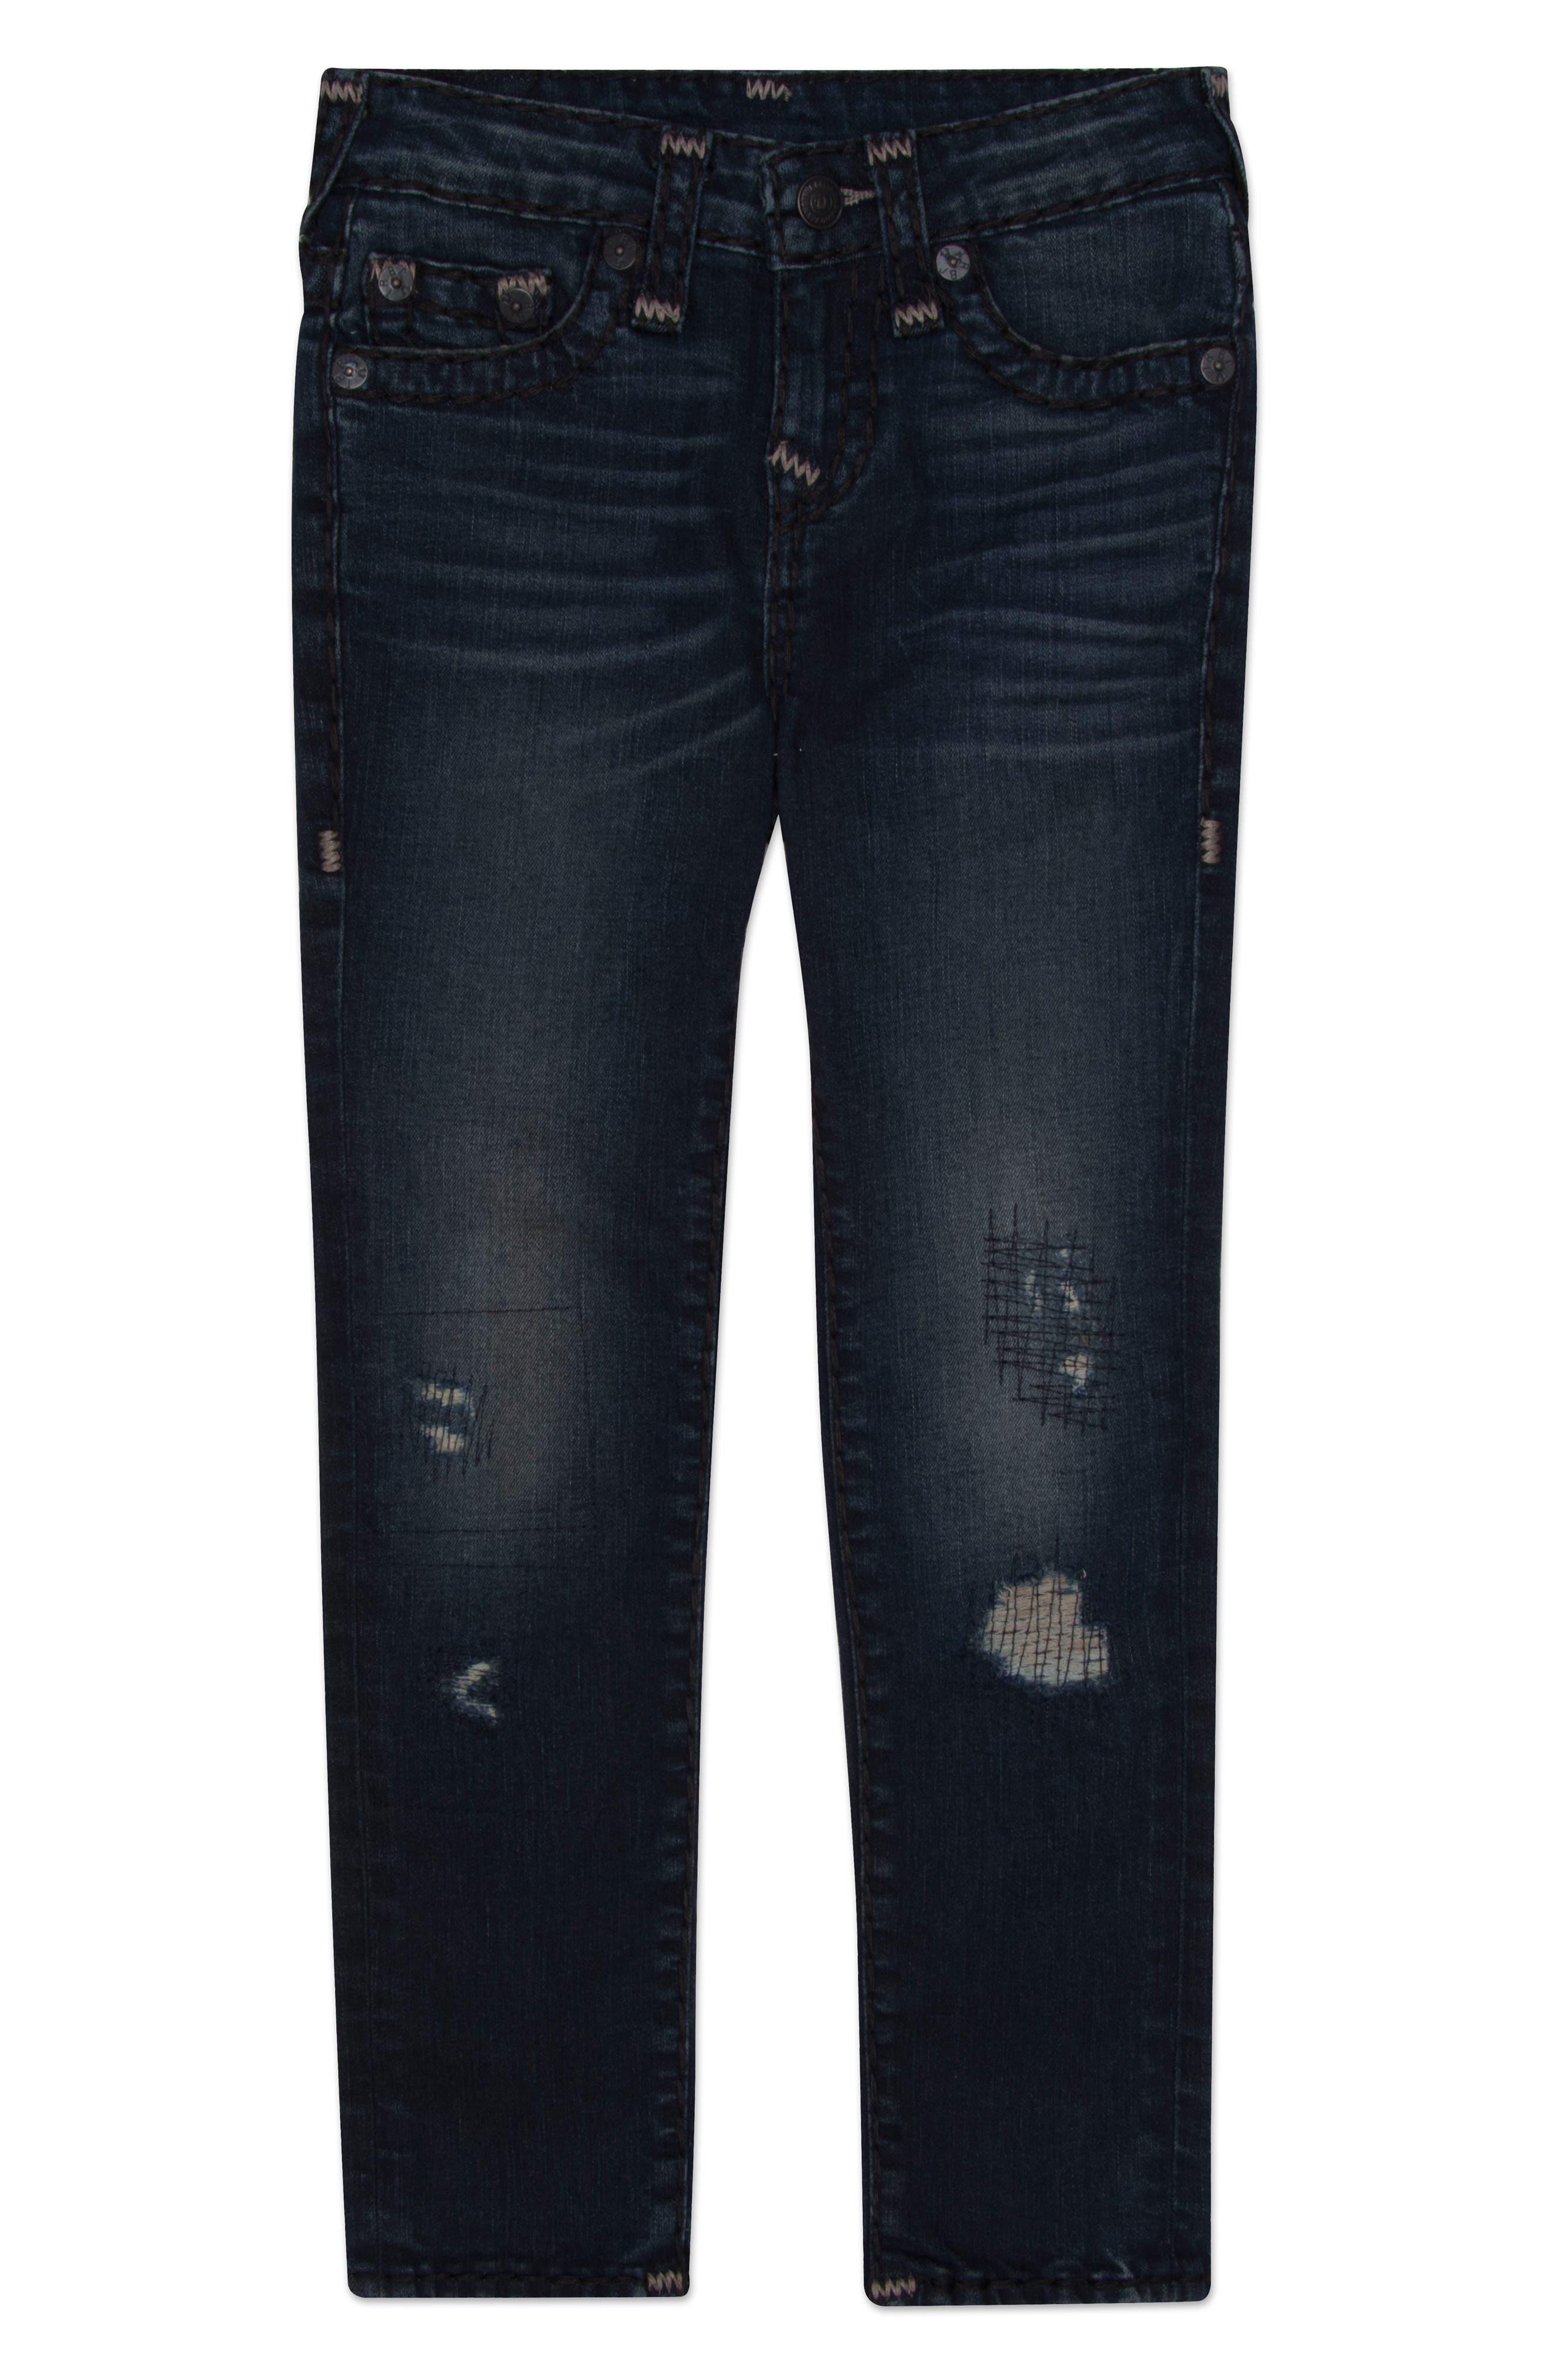 Geno Super T Jeans,                             Main thumbnail 1, color,                             022